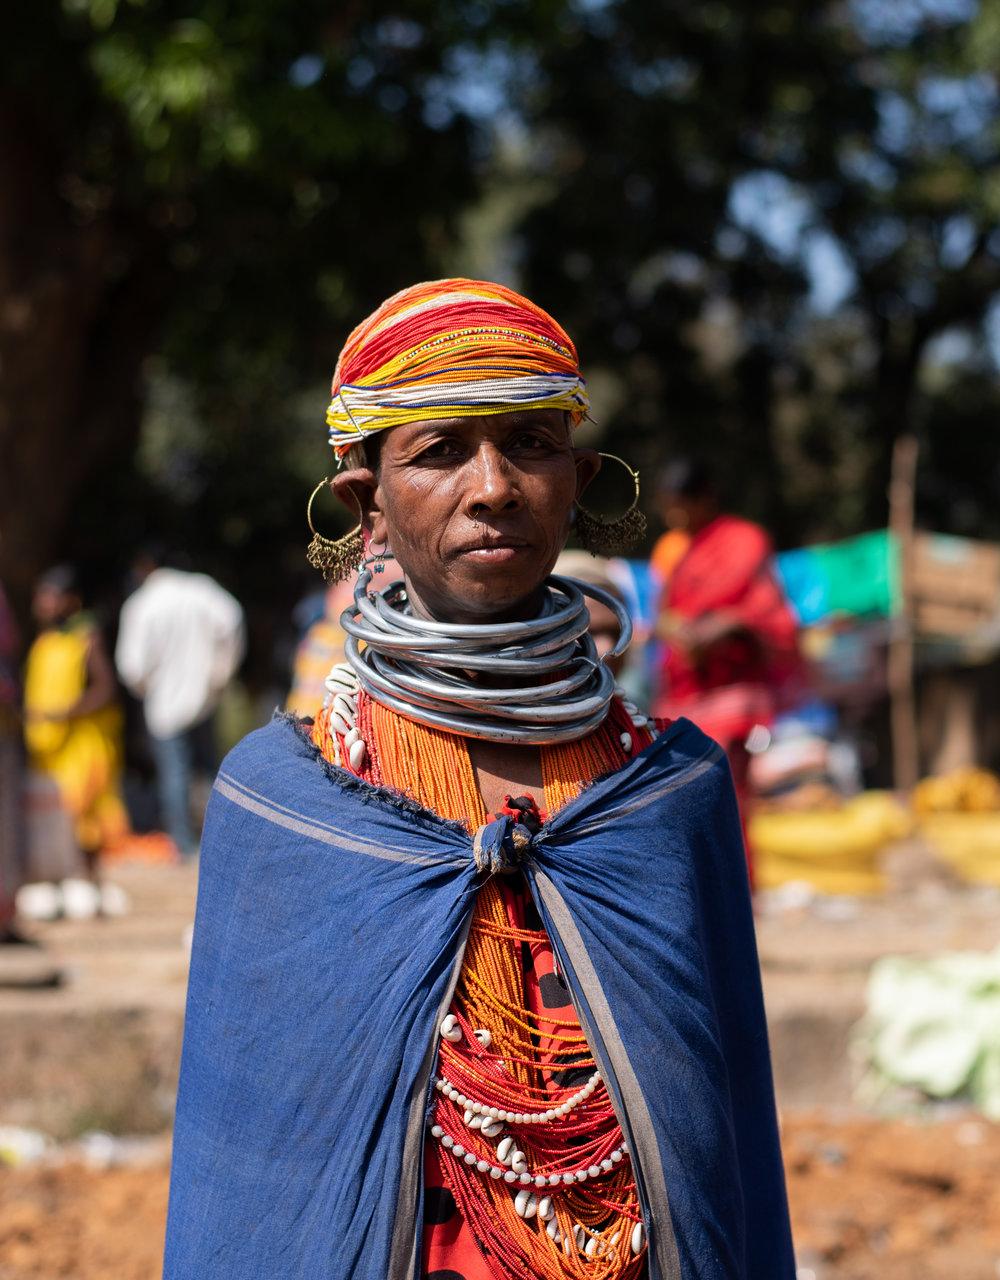 Bonda woman at the local market